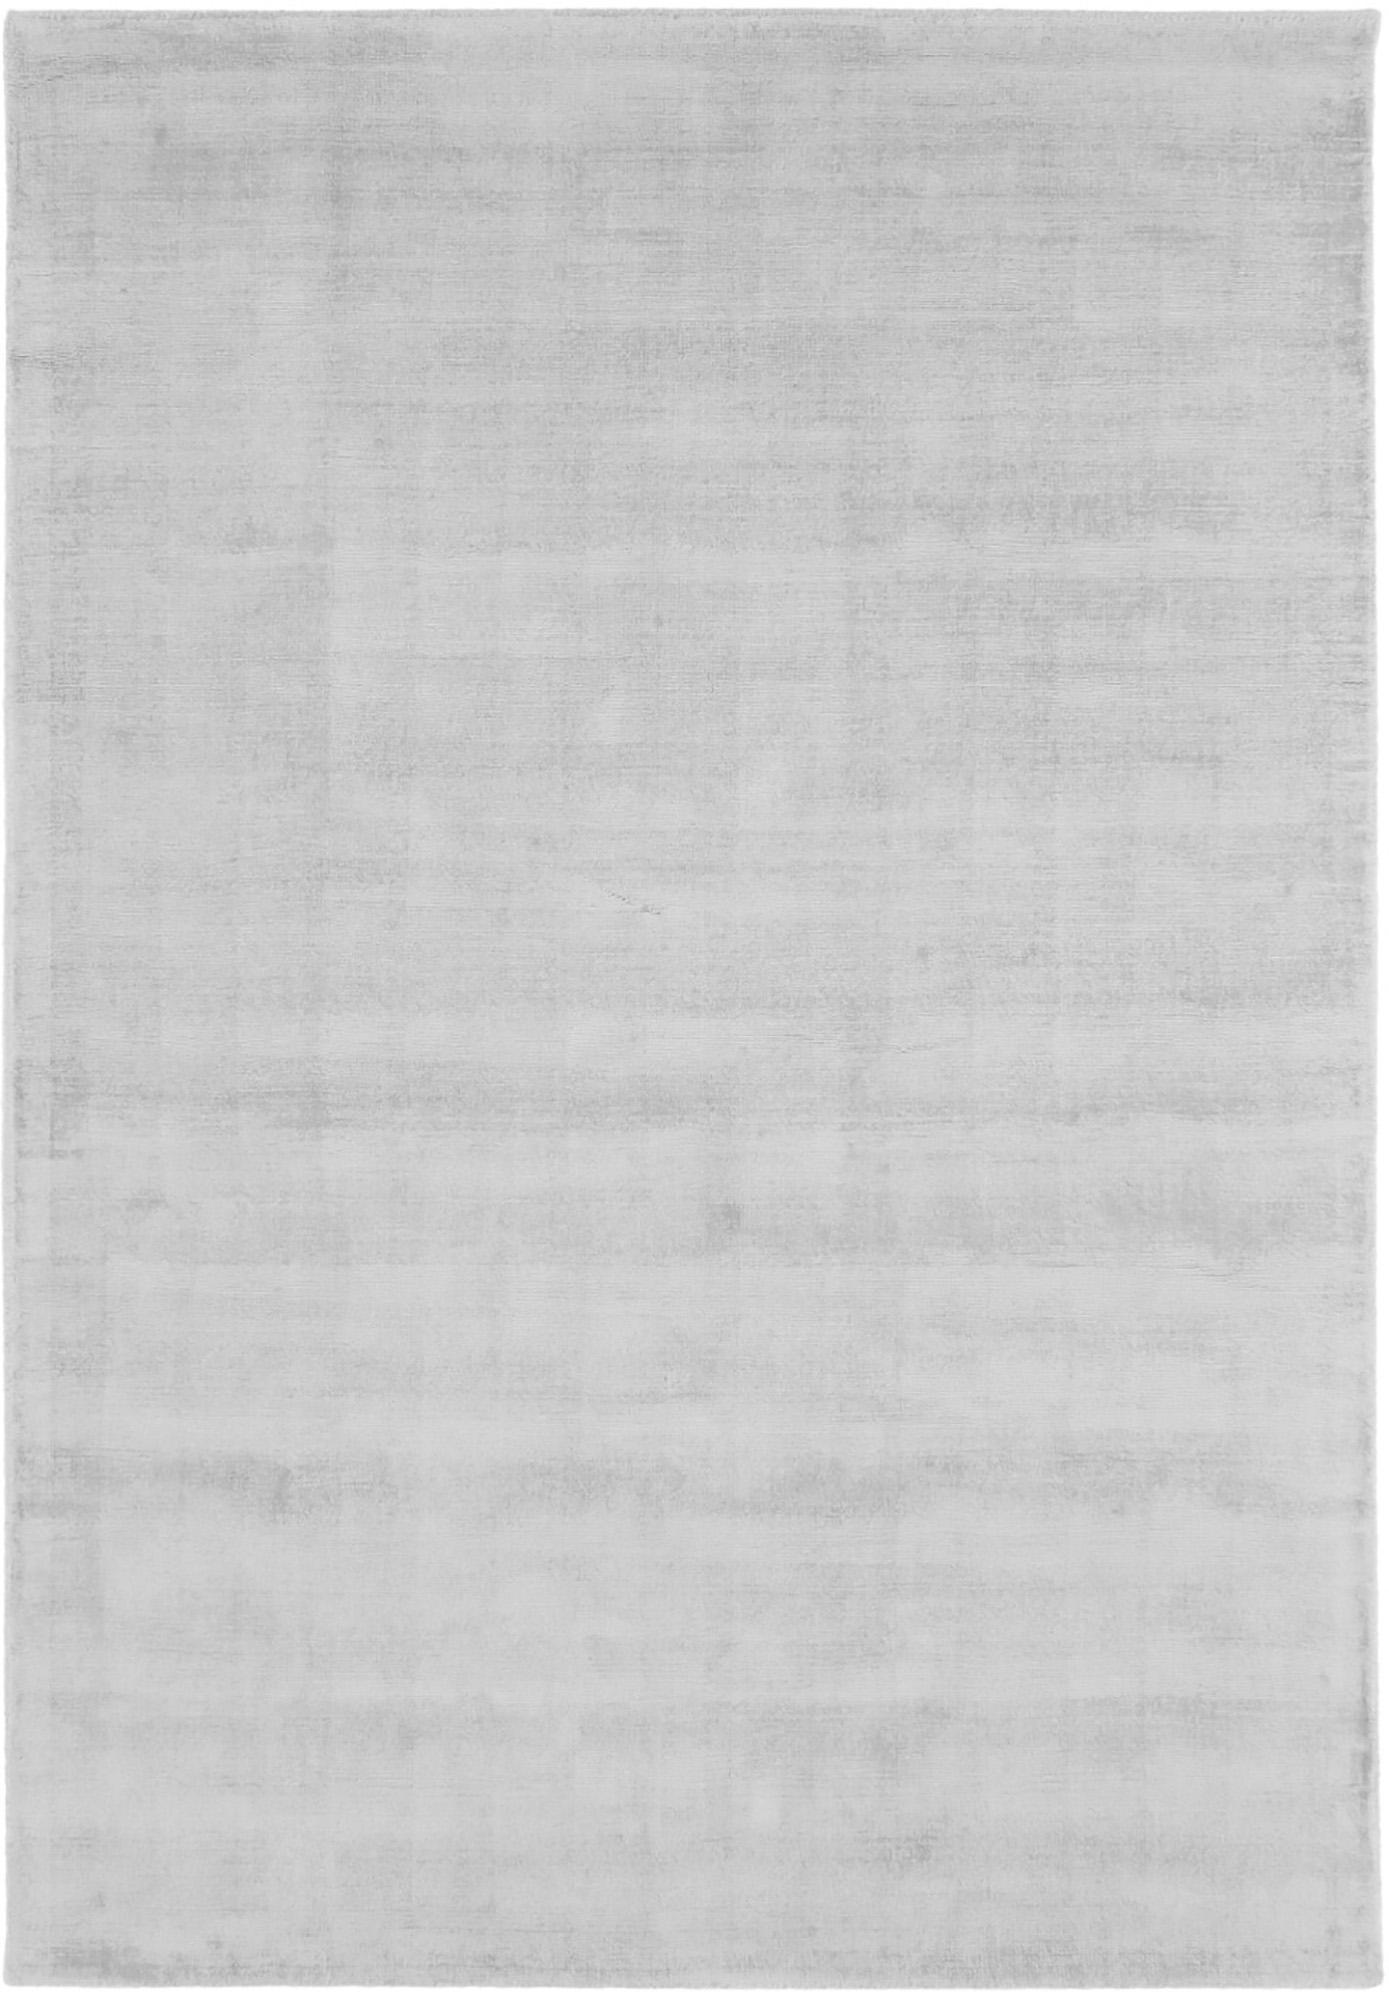 Handgewebter Viskoseteppich Jane in Silbergrau, Flor: 100% Viskose, Silbergrau, B 160 x L 230 cm (Grösse M)